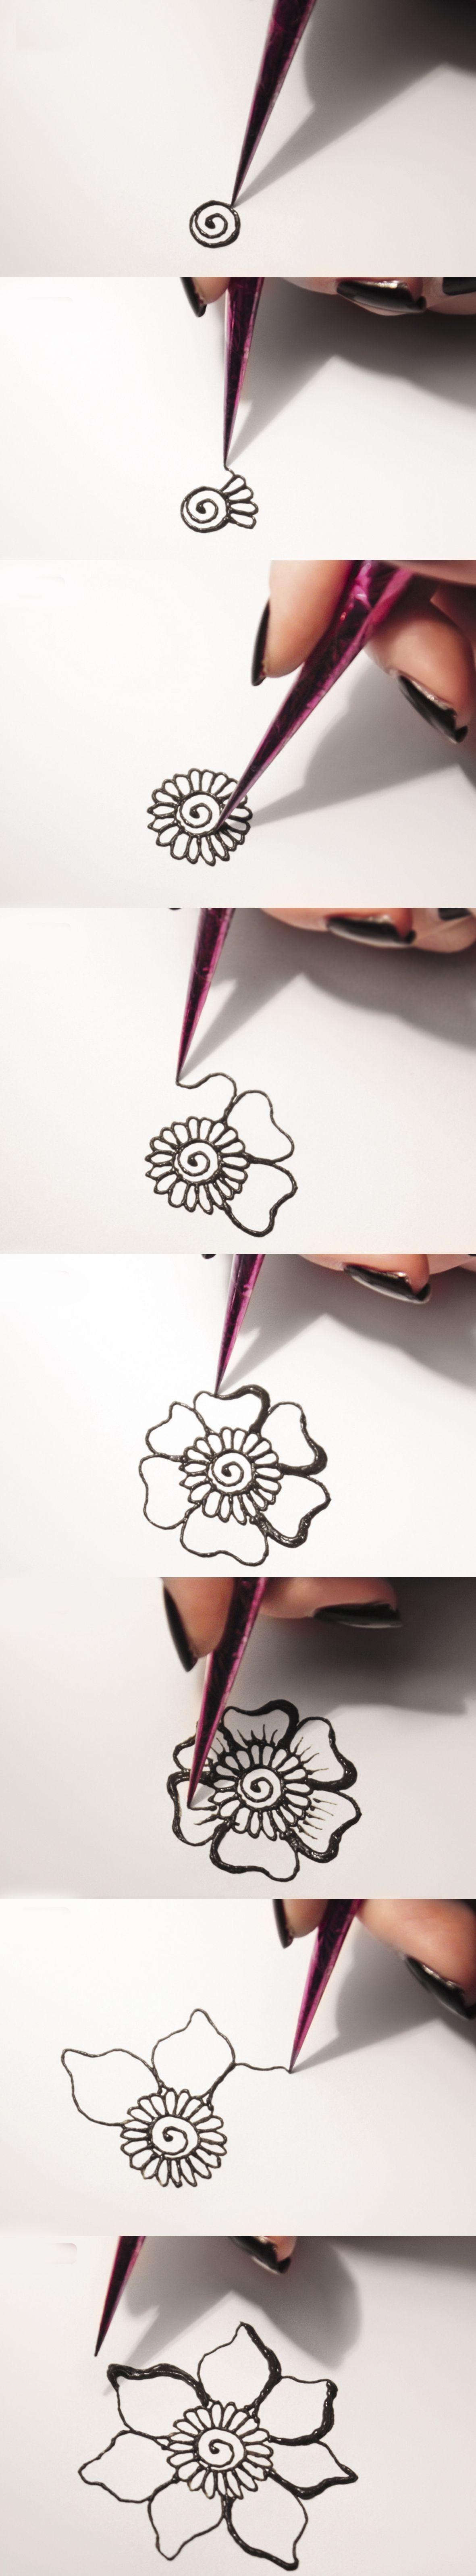 DIY Idea for mehndi. Easy tutorial for mehndi-f… | Craft Ideas and ...